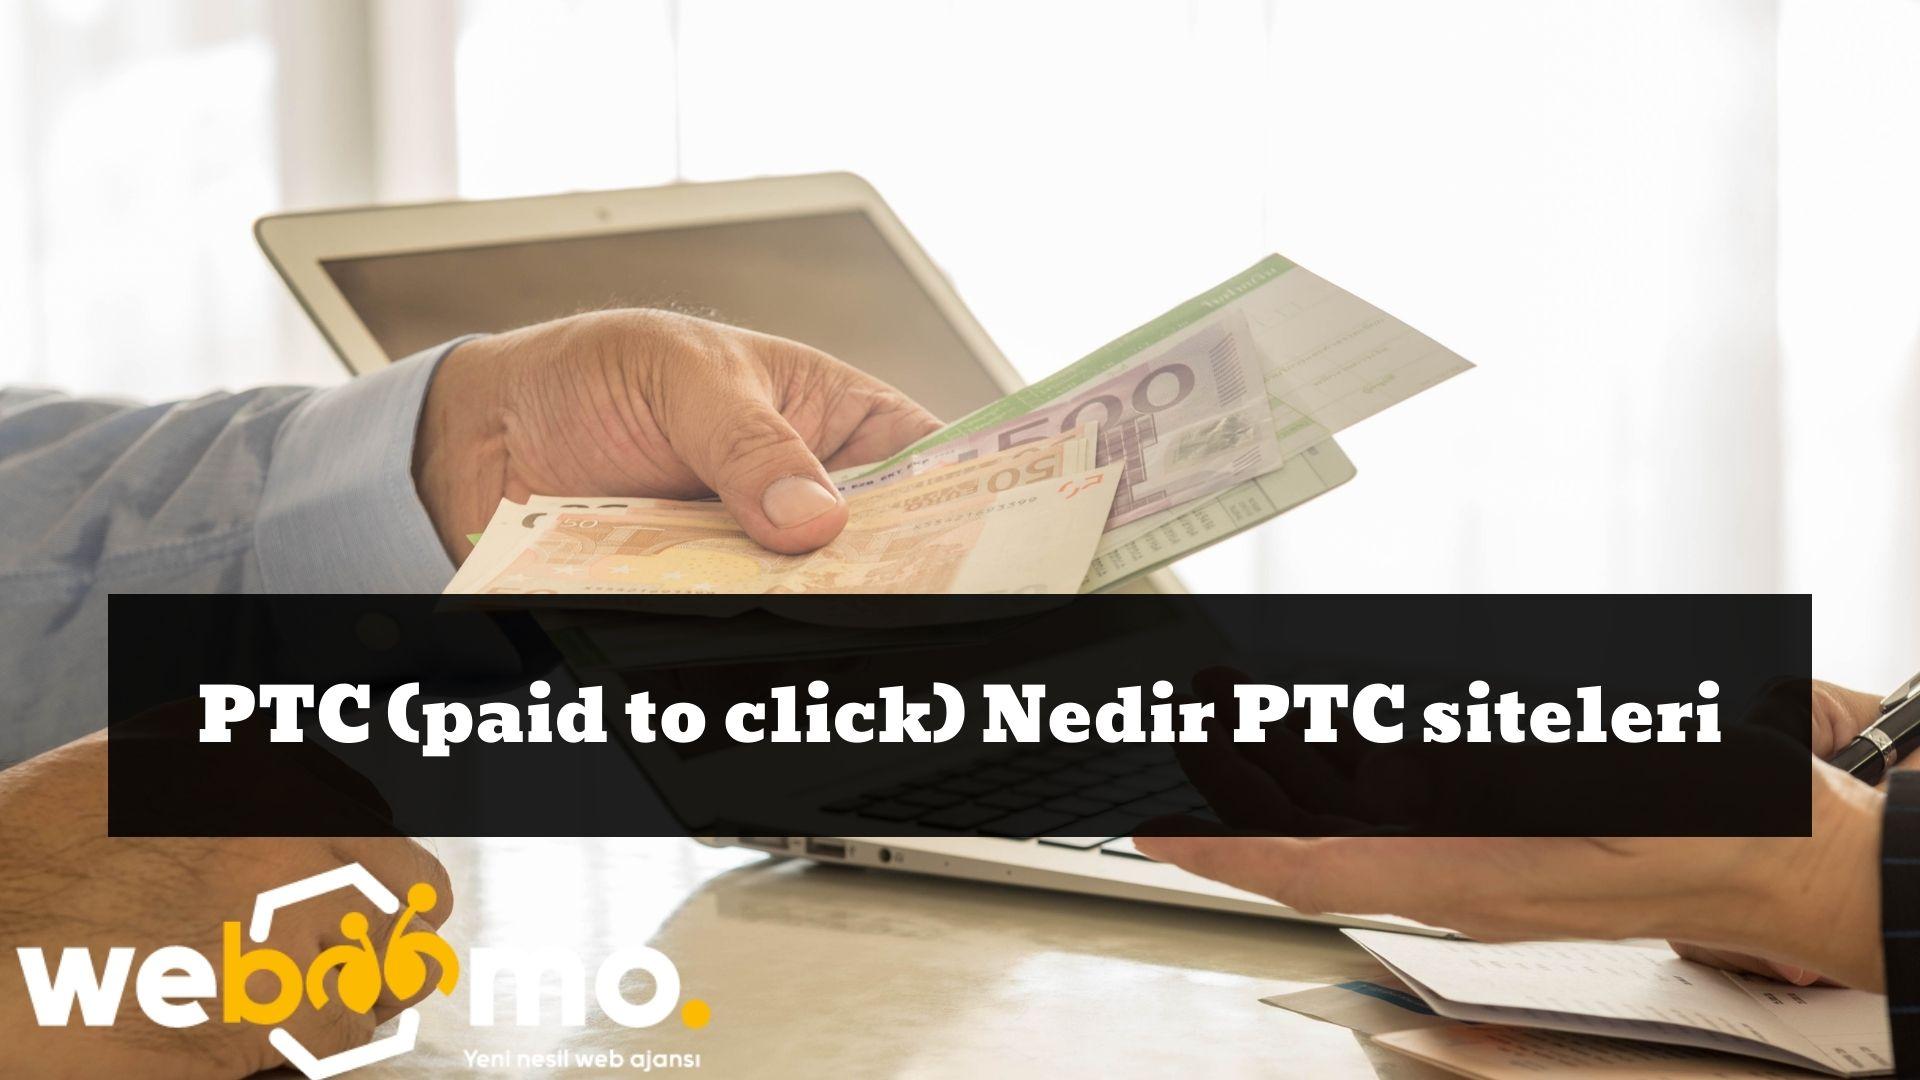 PTC (paid to click) Nedir PTC siteleri